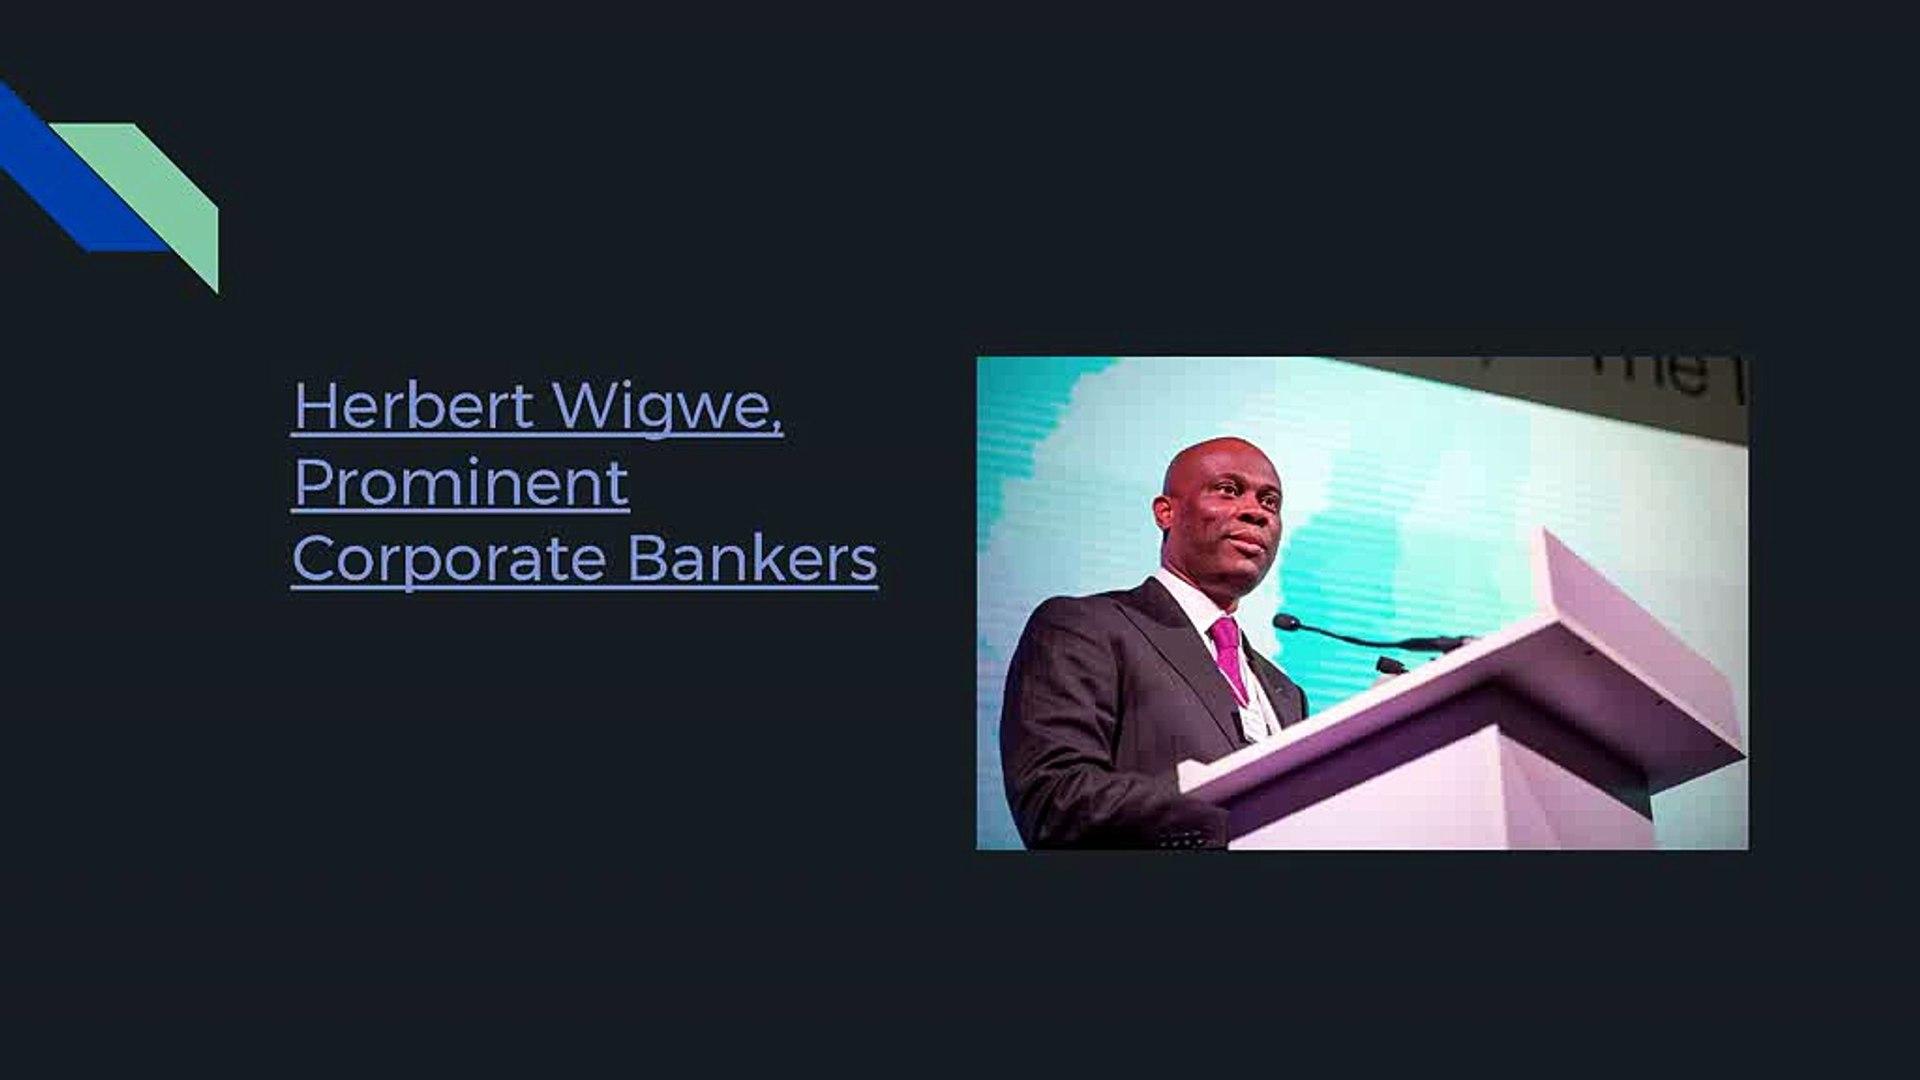 Herbert Wigwe: Financial Services